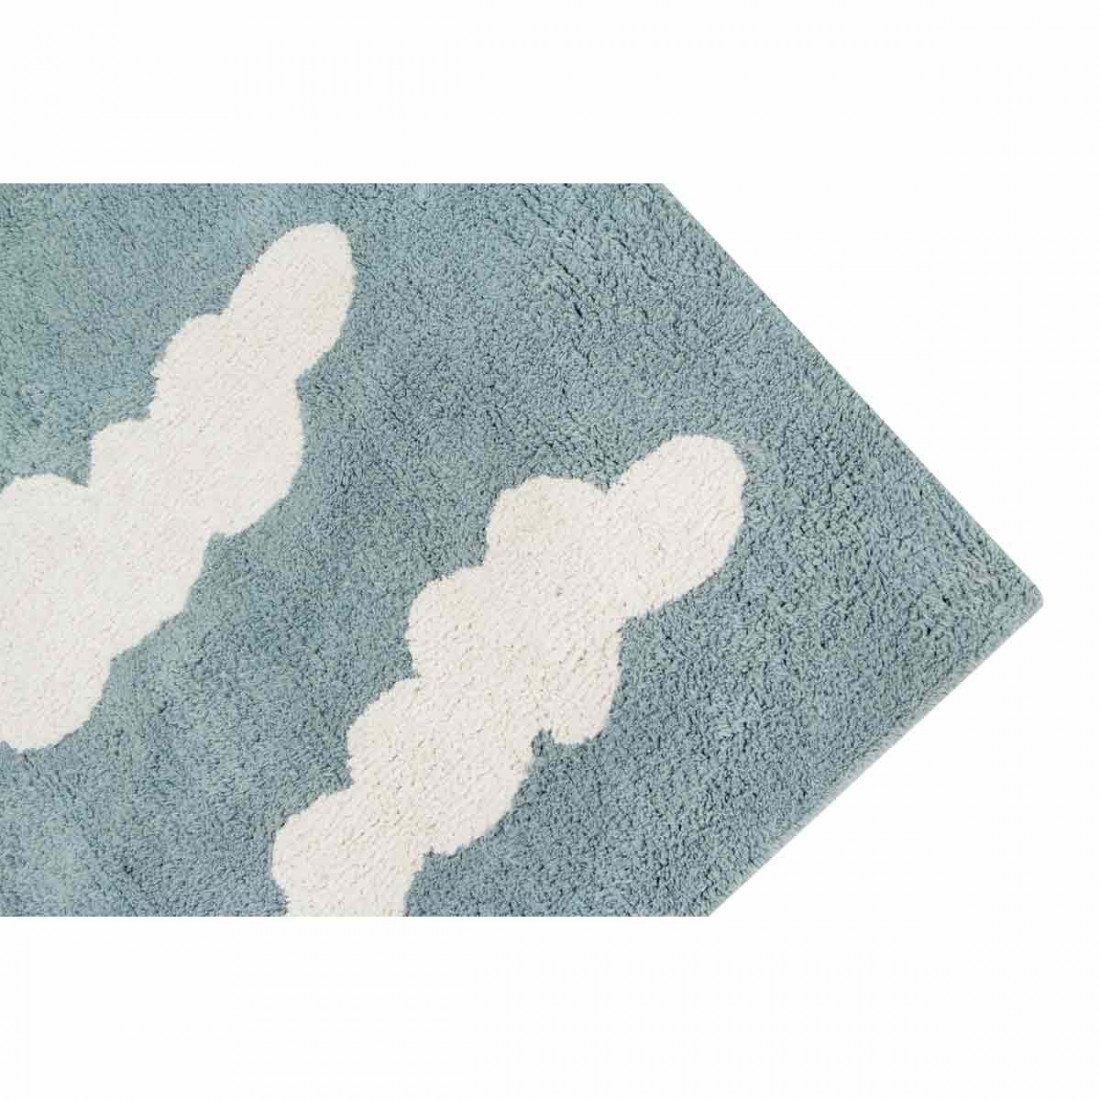 tapis enfant coton lavable bleu vintage nuages blanc. Black Bedroom Furniture Sets. Home Design Ideas